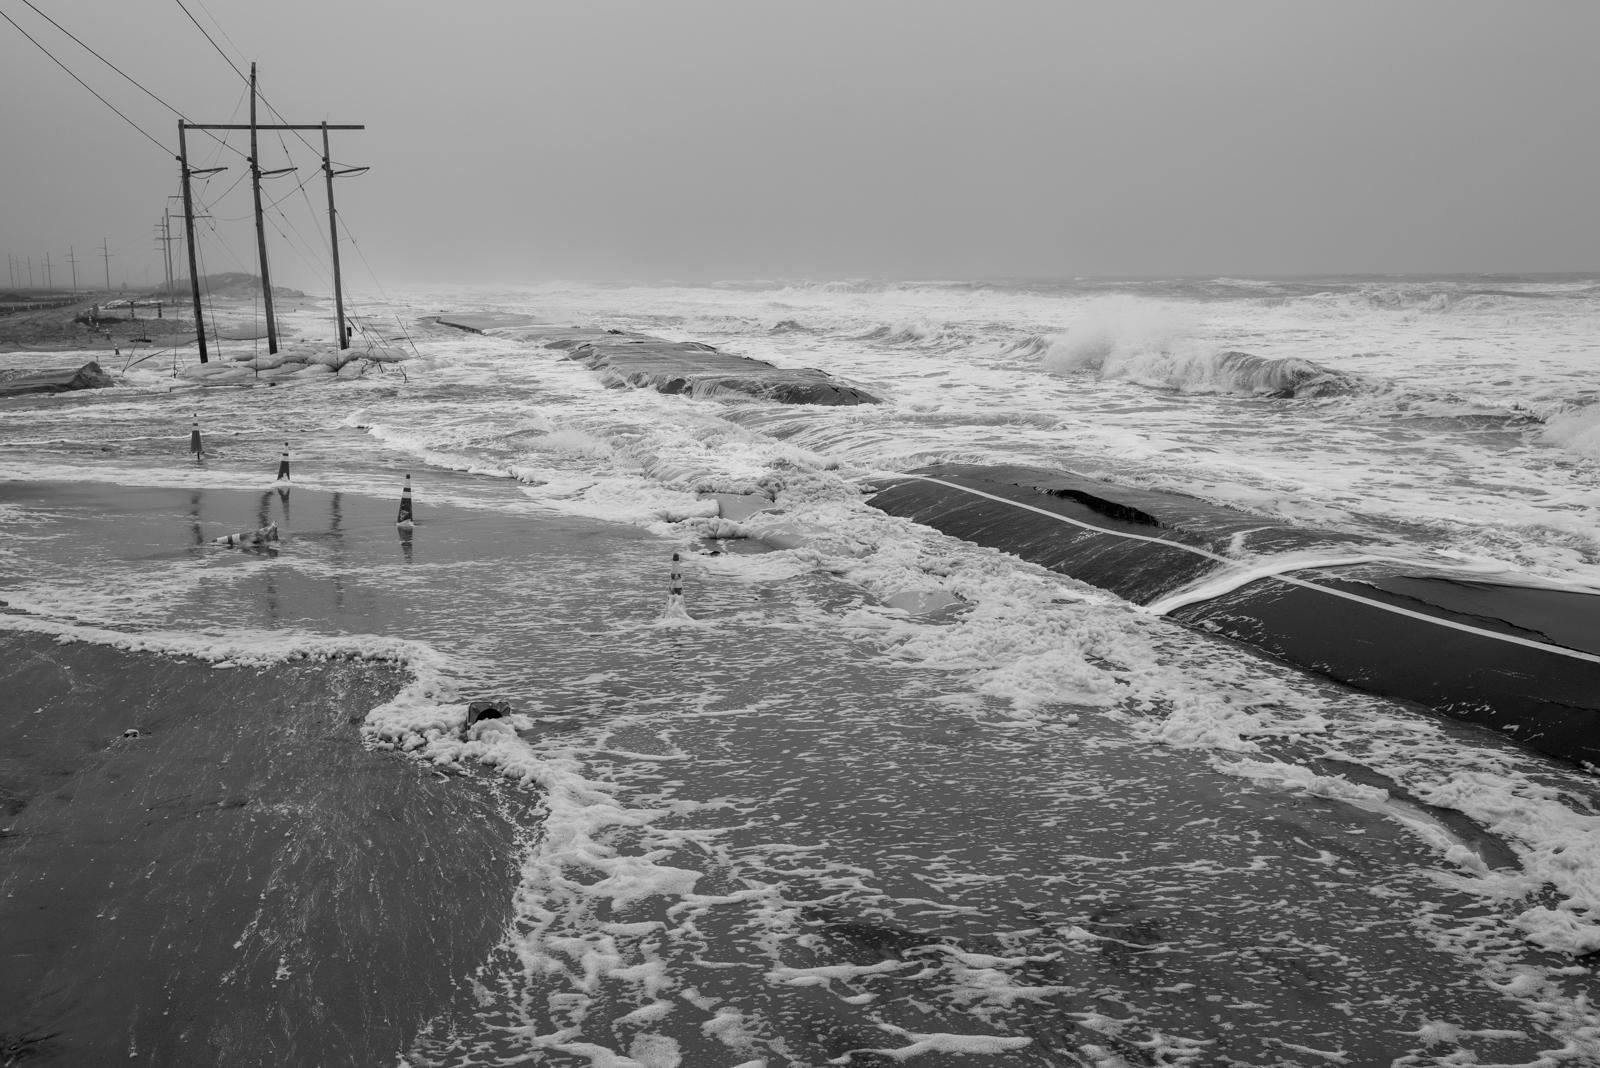 Mirlo Beach S-Turns, Hurricane Sandy, October 2012